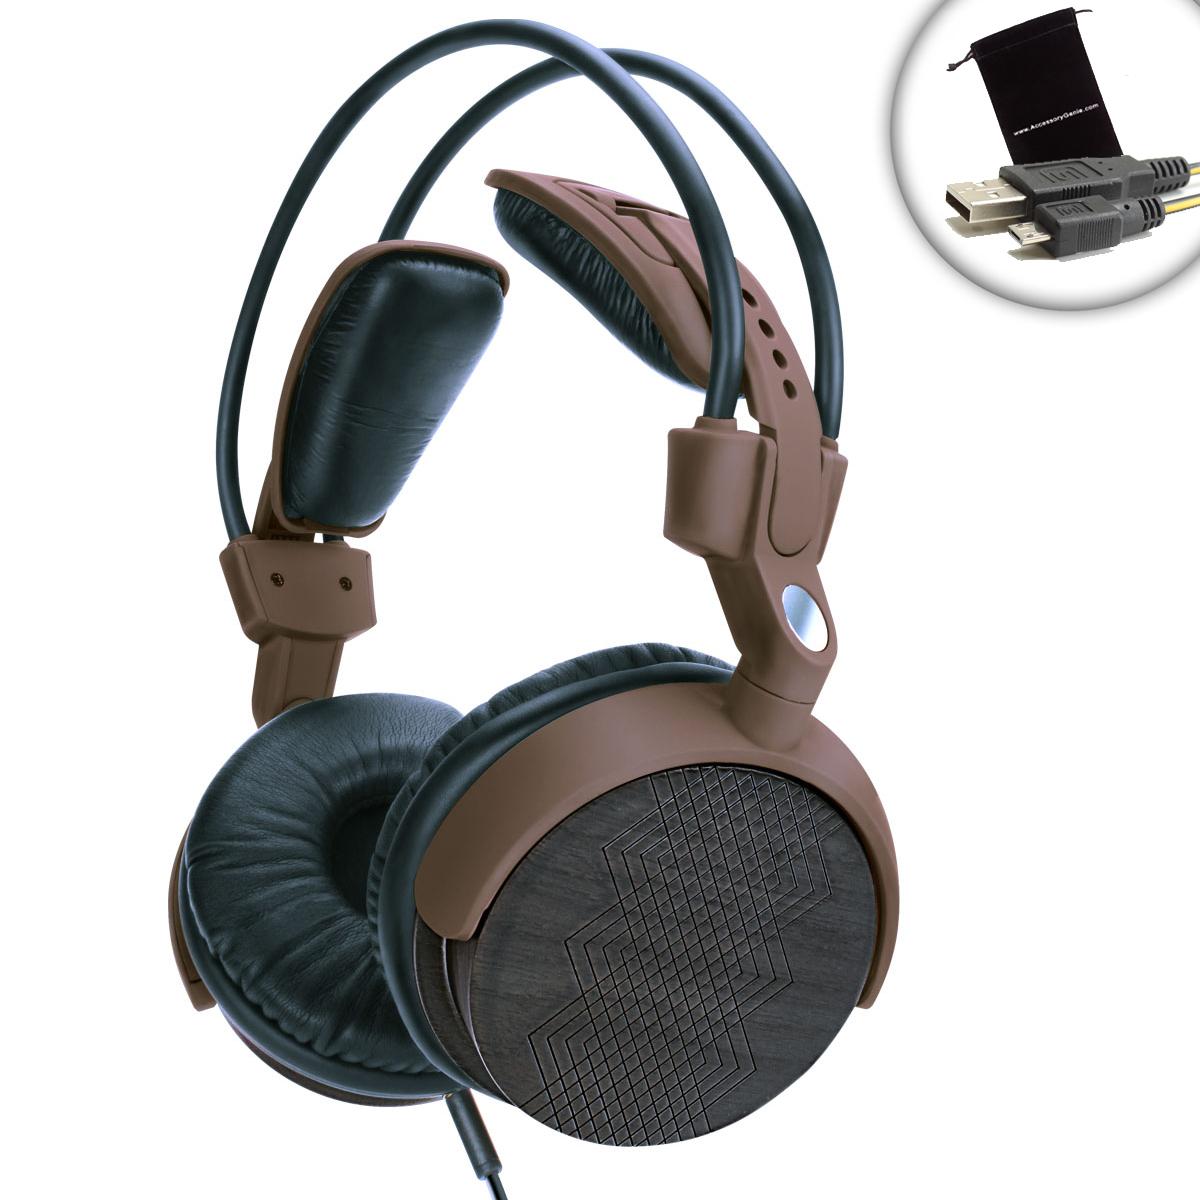 Audiolux Wdx Adjustable Over Ear Headphones By Gogroove